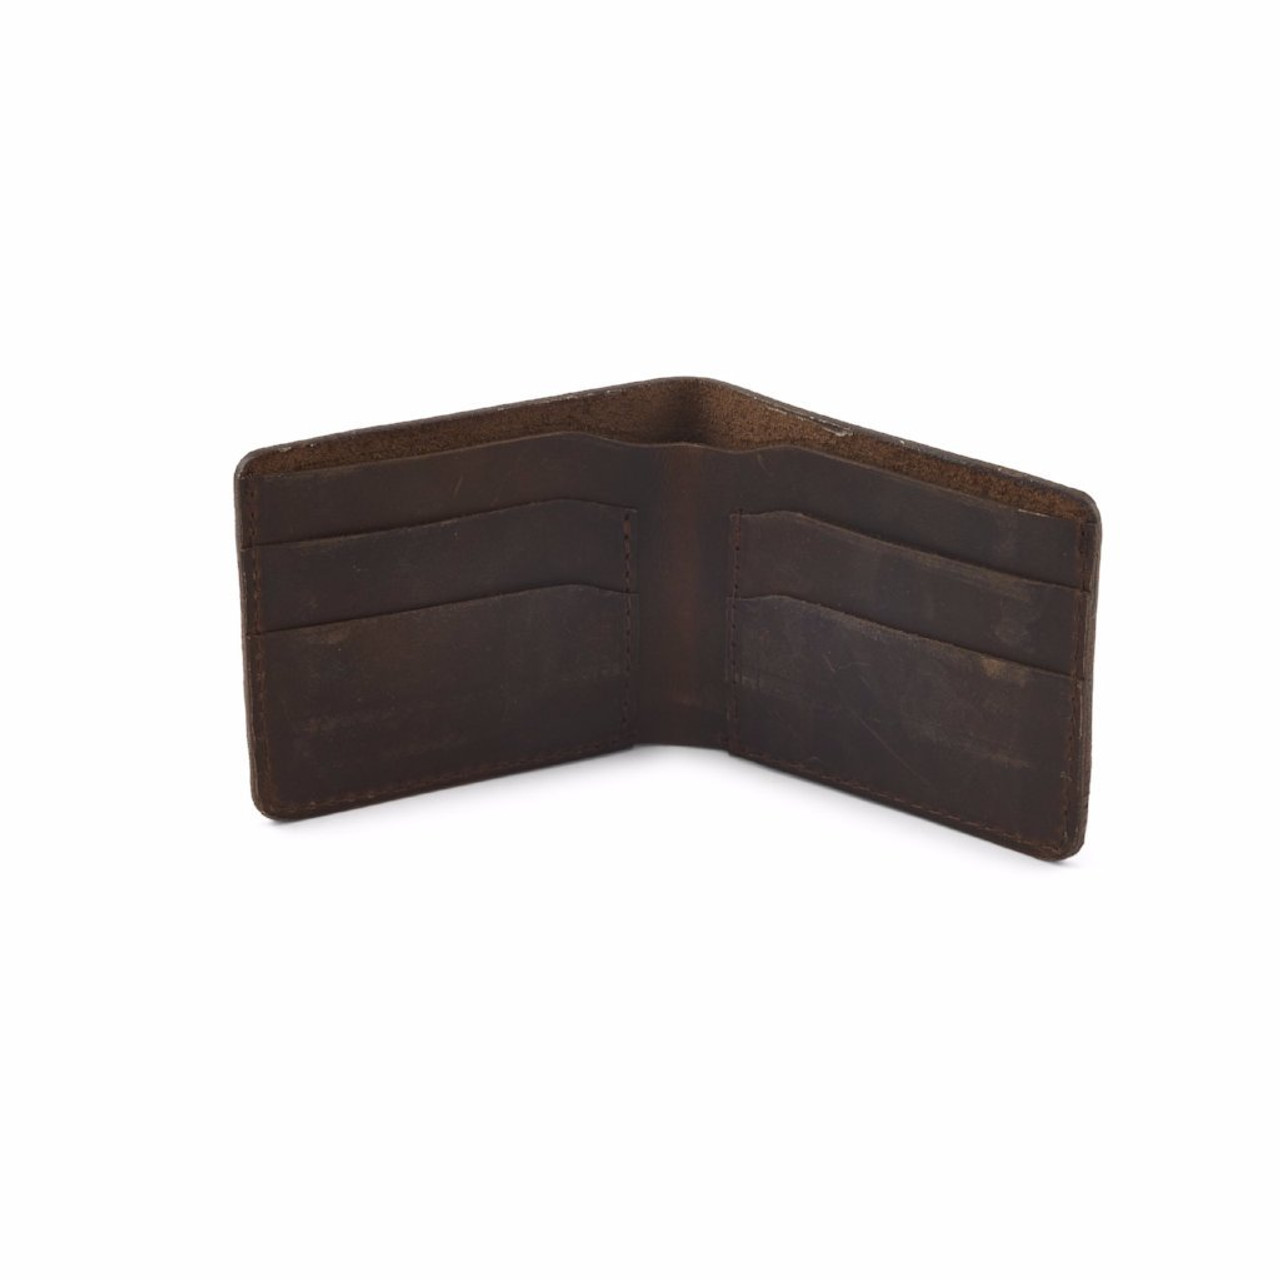 Knox Bifold Leather Wallet - Inside - Dark Brown - by Rustico